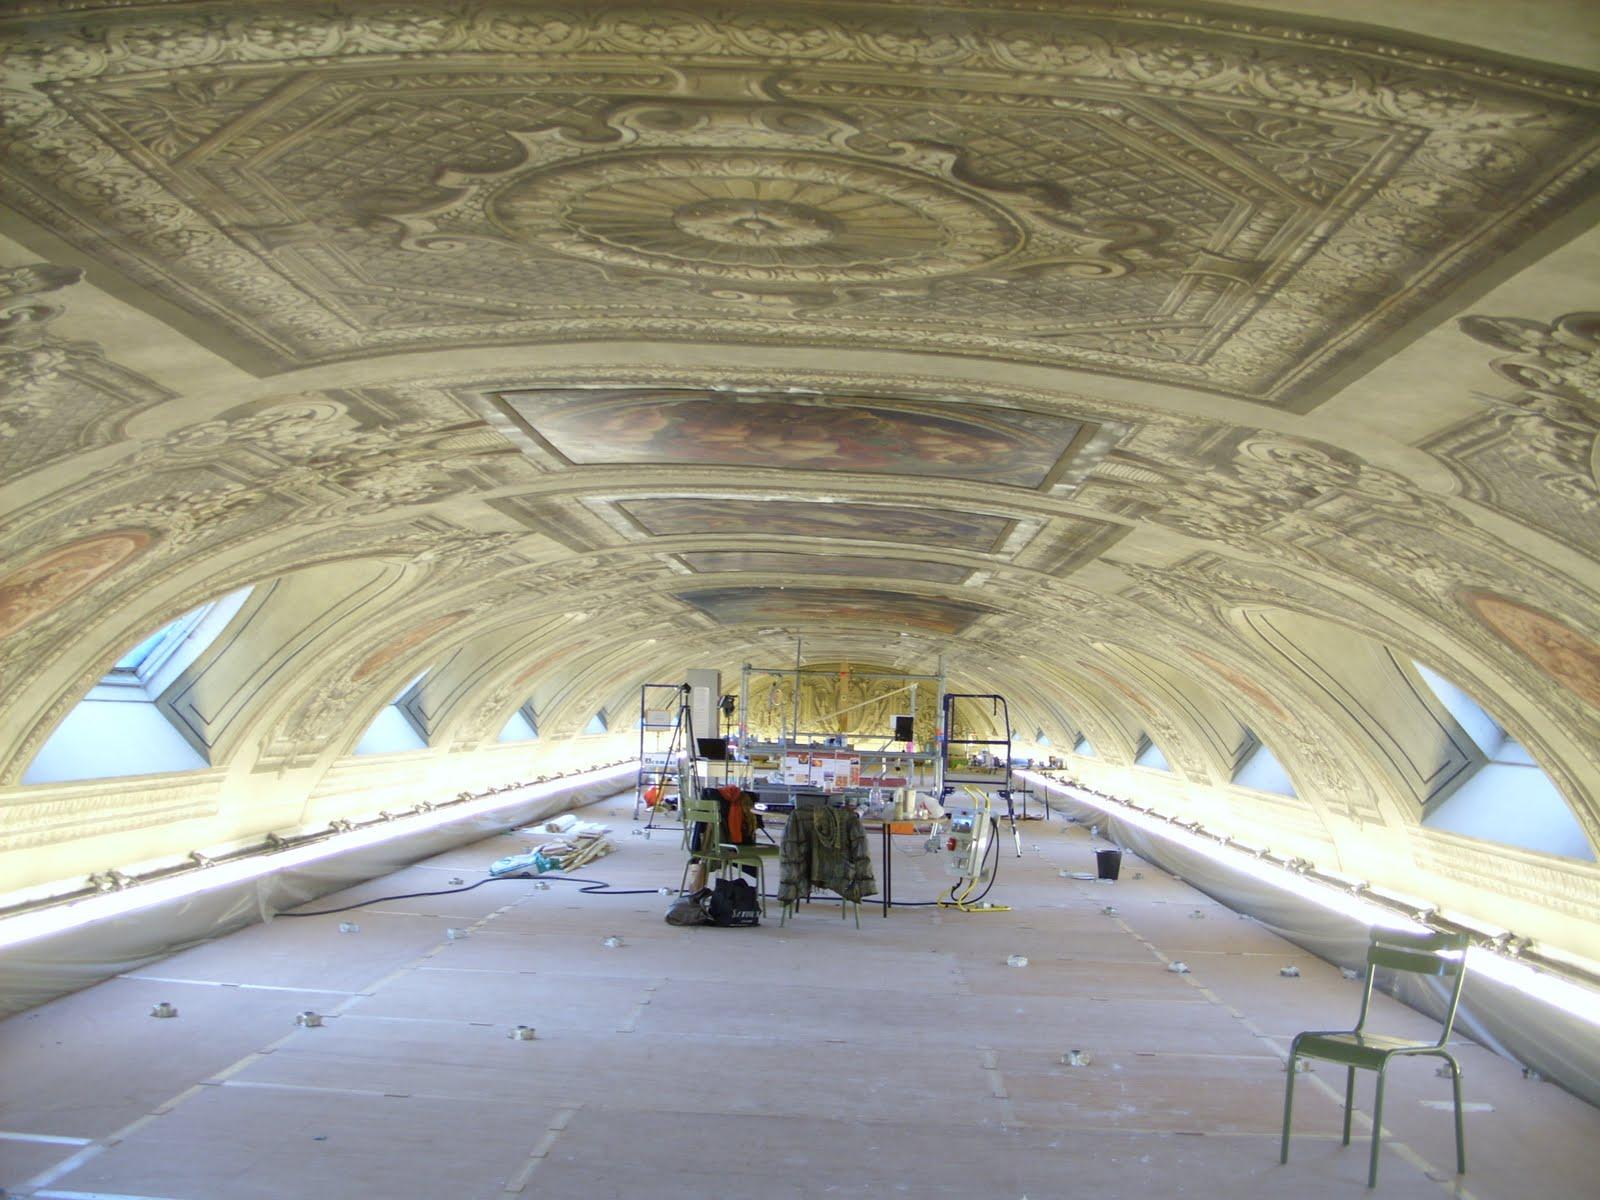 Pauline restaure peintures murales for Retouche peinture plafond